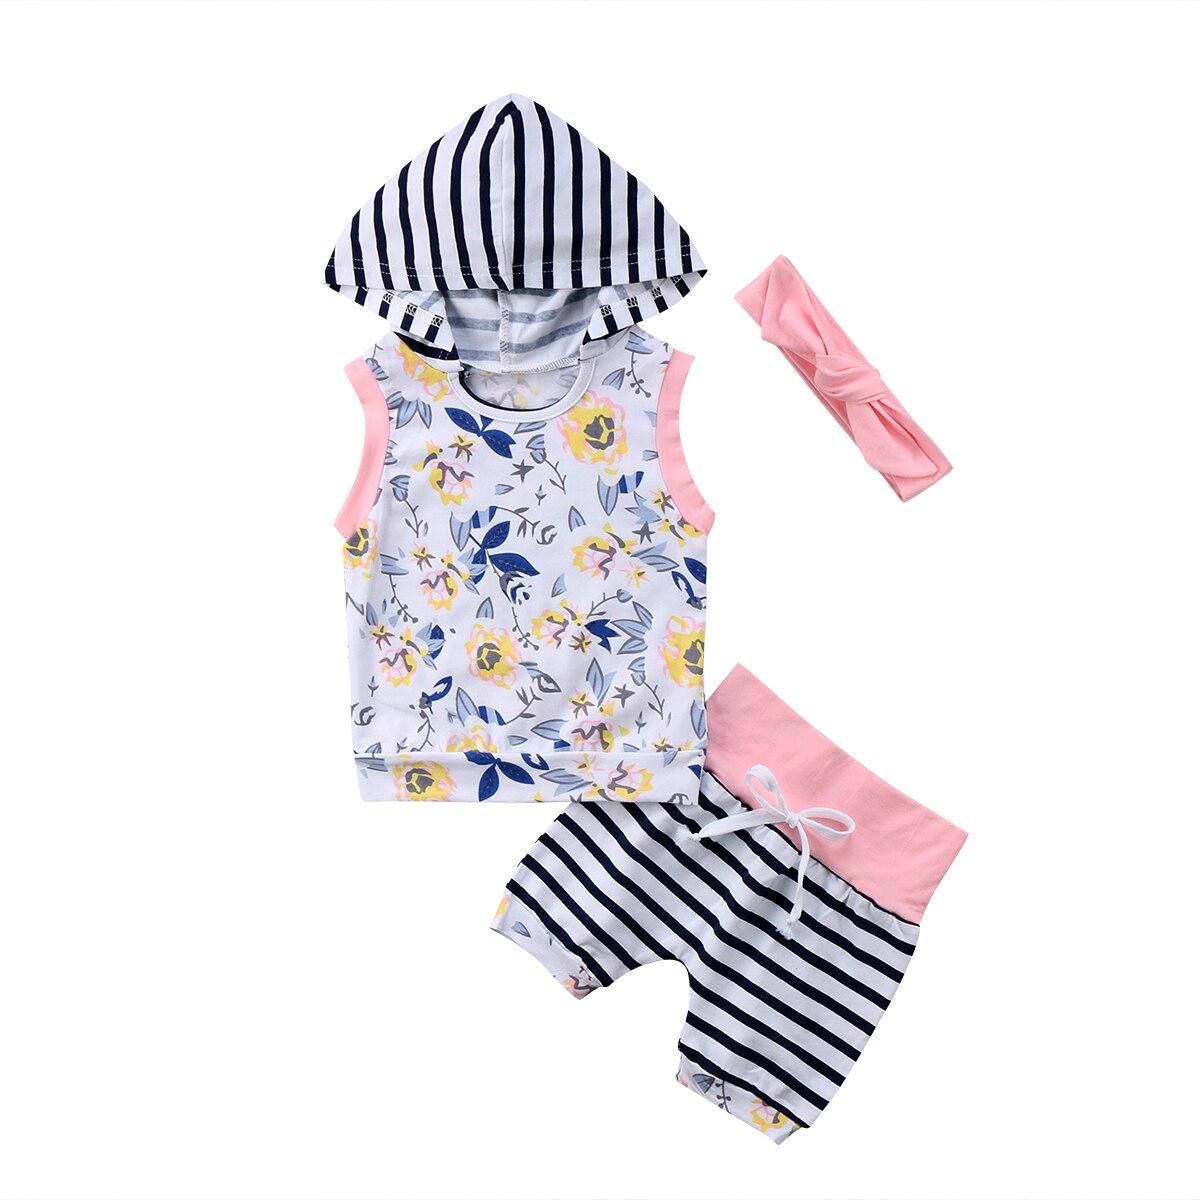 Pudcoco Newborn Infant Baby Kid Fashion Girls HOT SALE 2PCS Floral Hooded Vest+Pants+Headband Clothes Set 0-24M